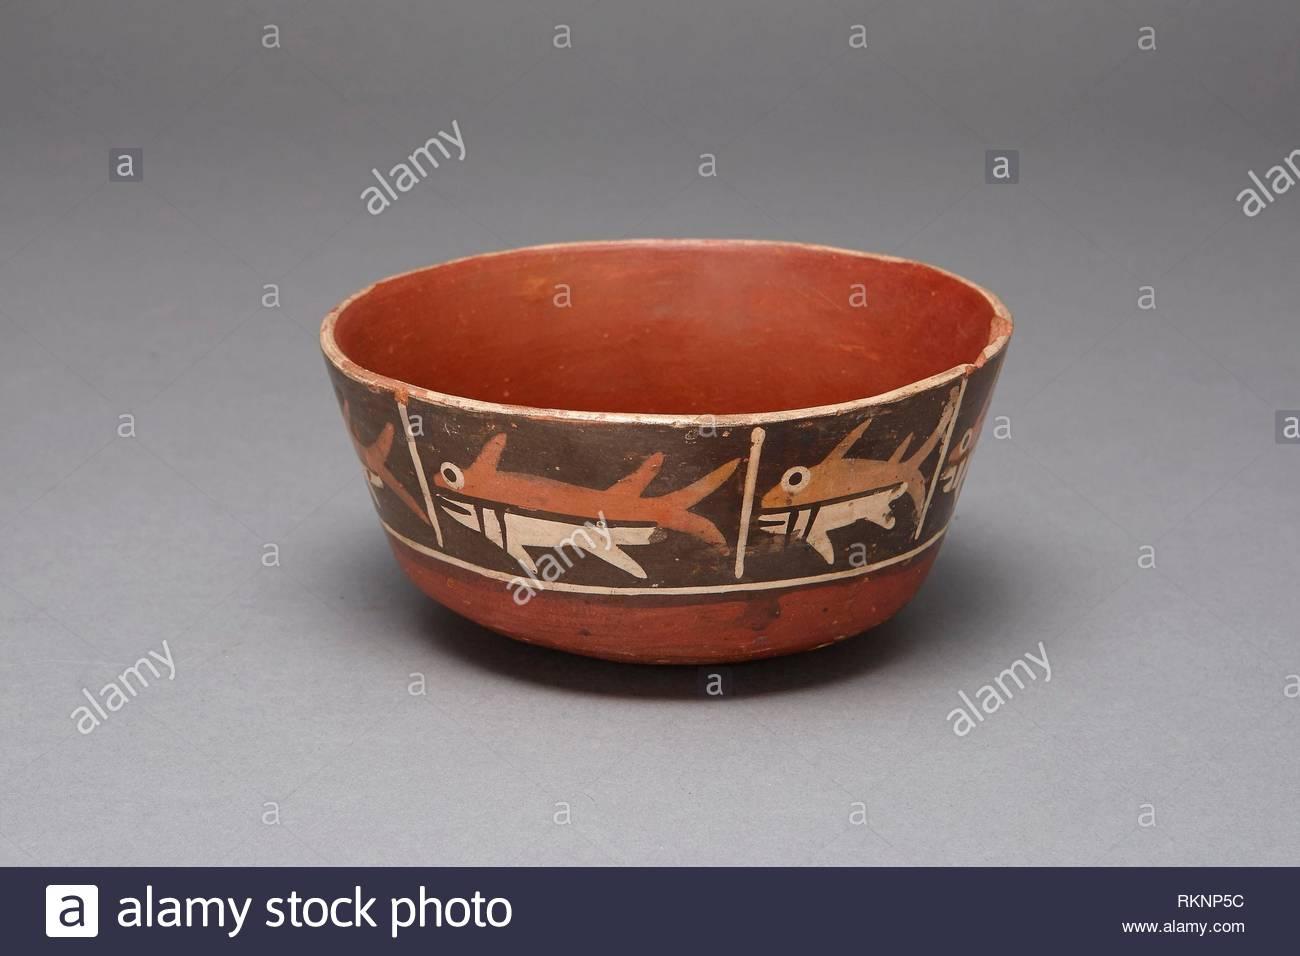 bowl with repeating depiction of a fish or shark 180 bcad 500 nazca south coast peru artist nazca origin peru date 180 bc500 ad RKNP5C